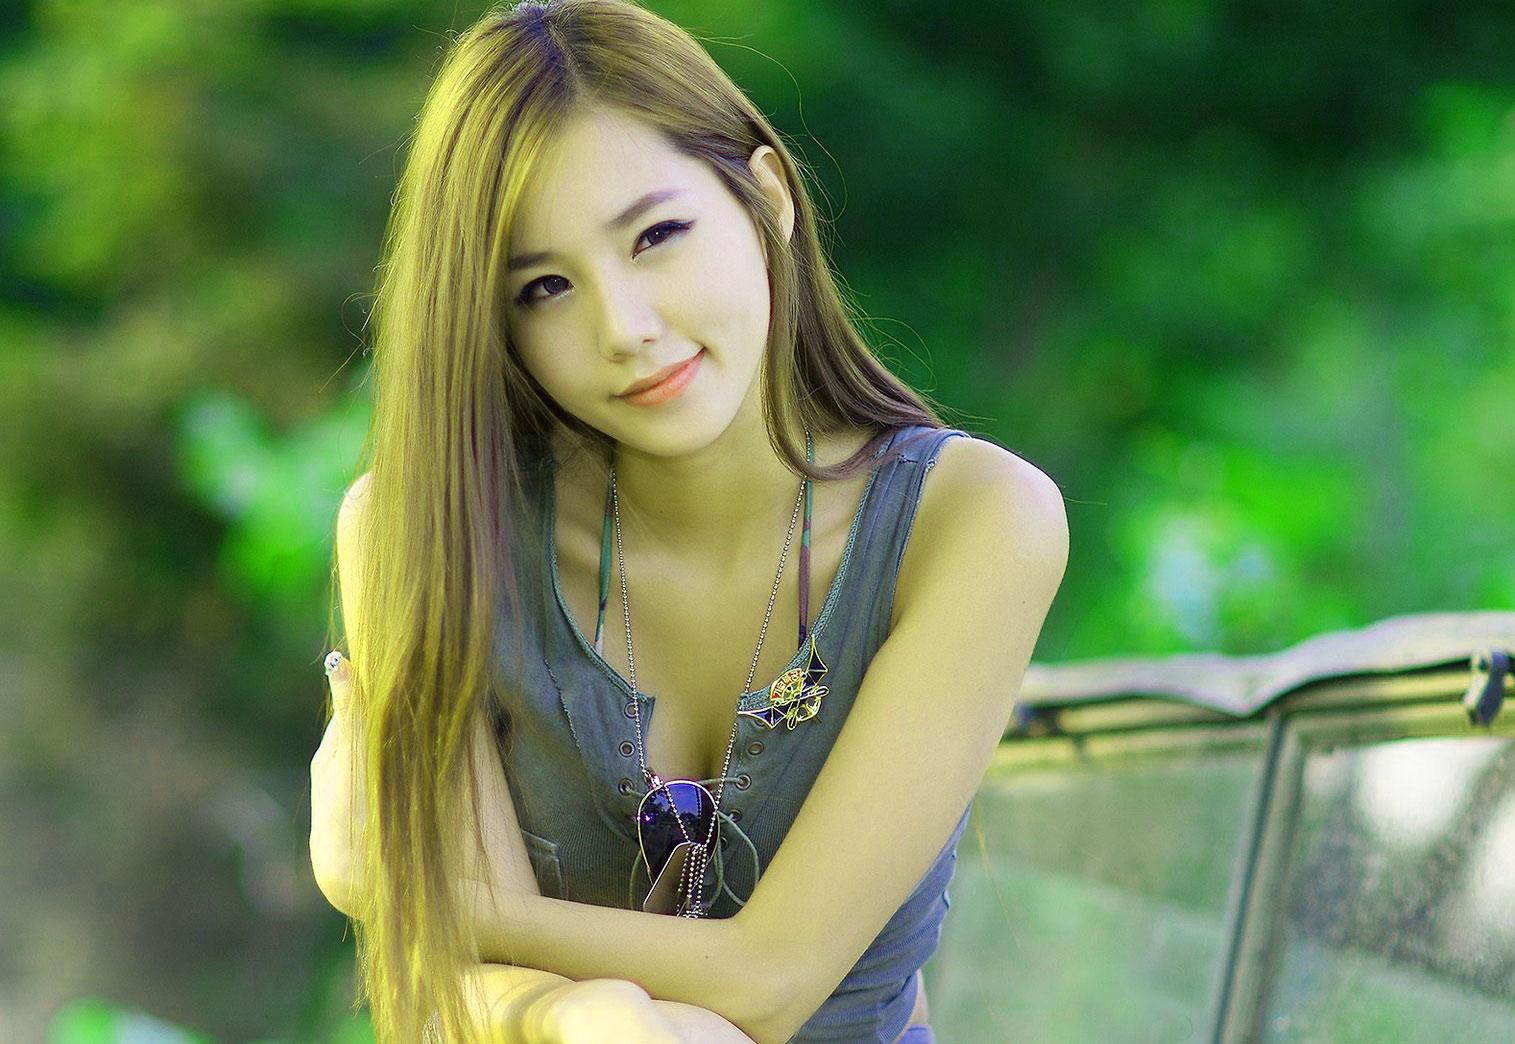 Love Beautiful Girls Images